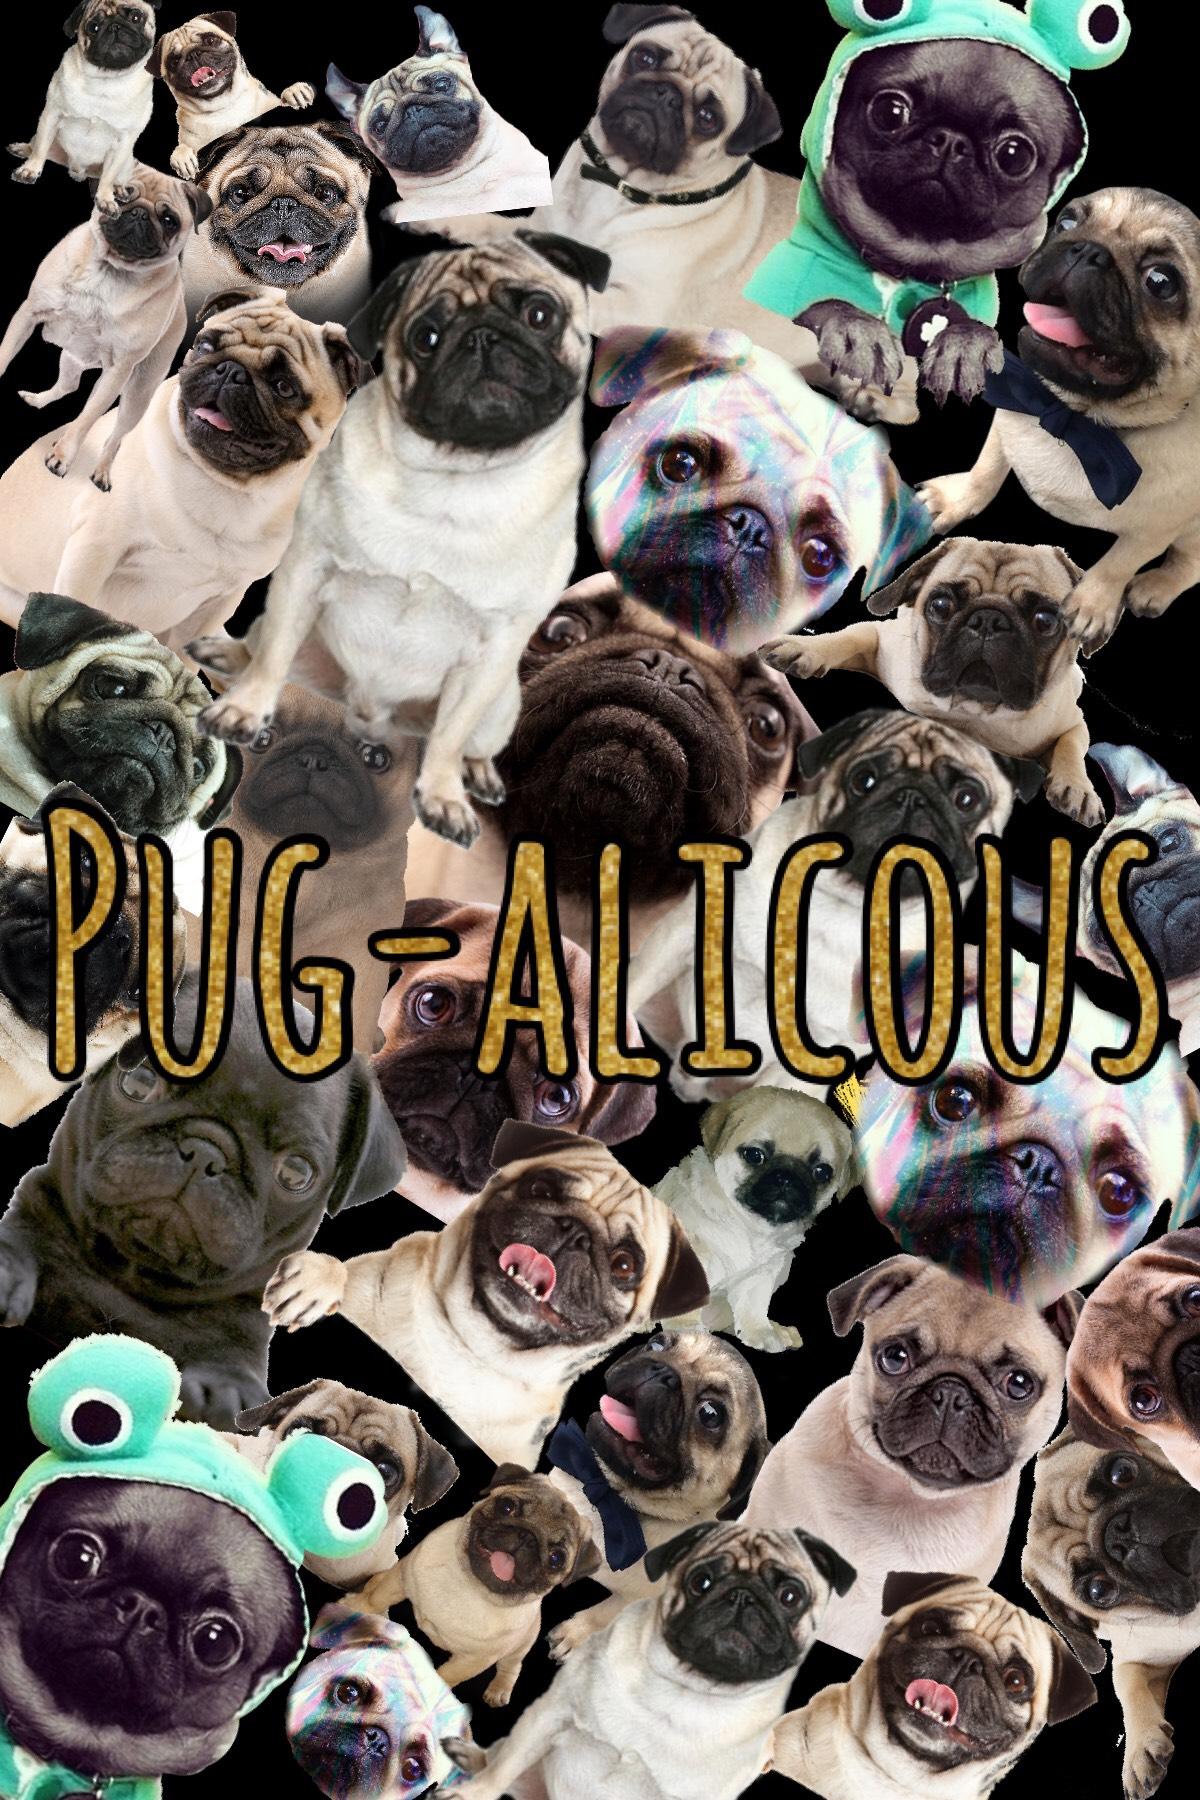 Tap Pug-alicous